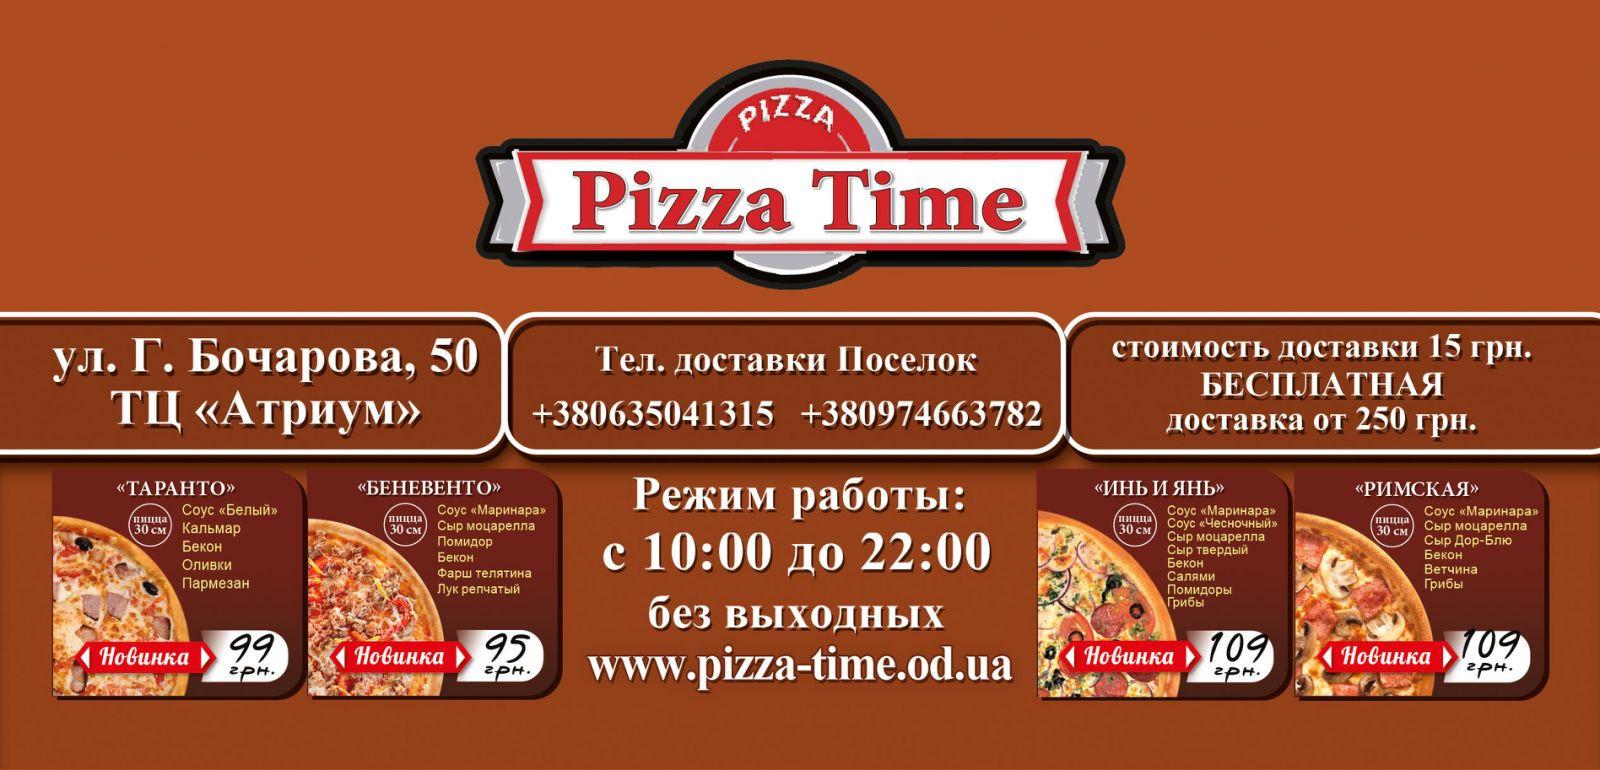 пицца 2.jpg